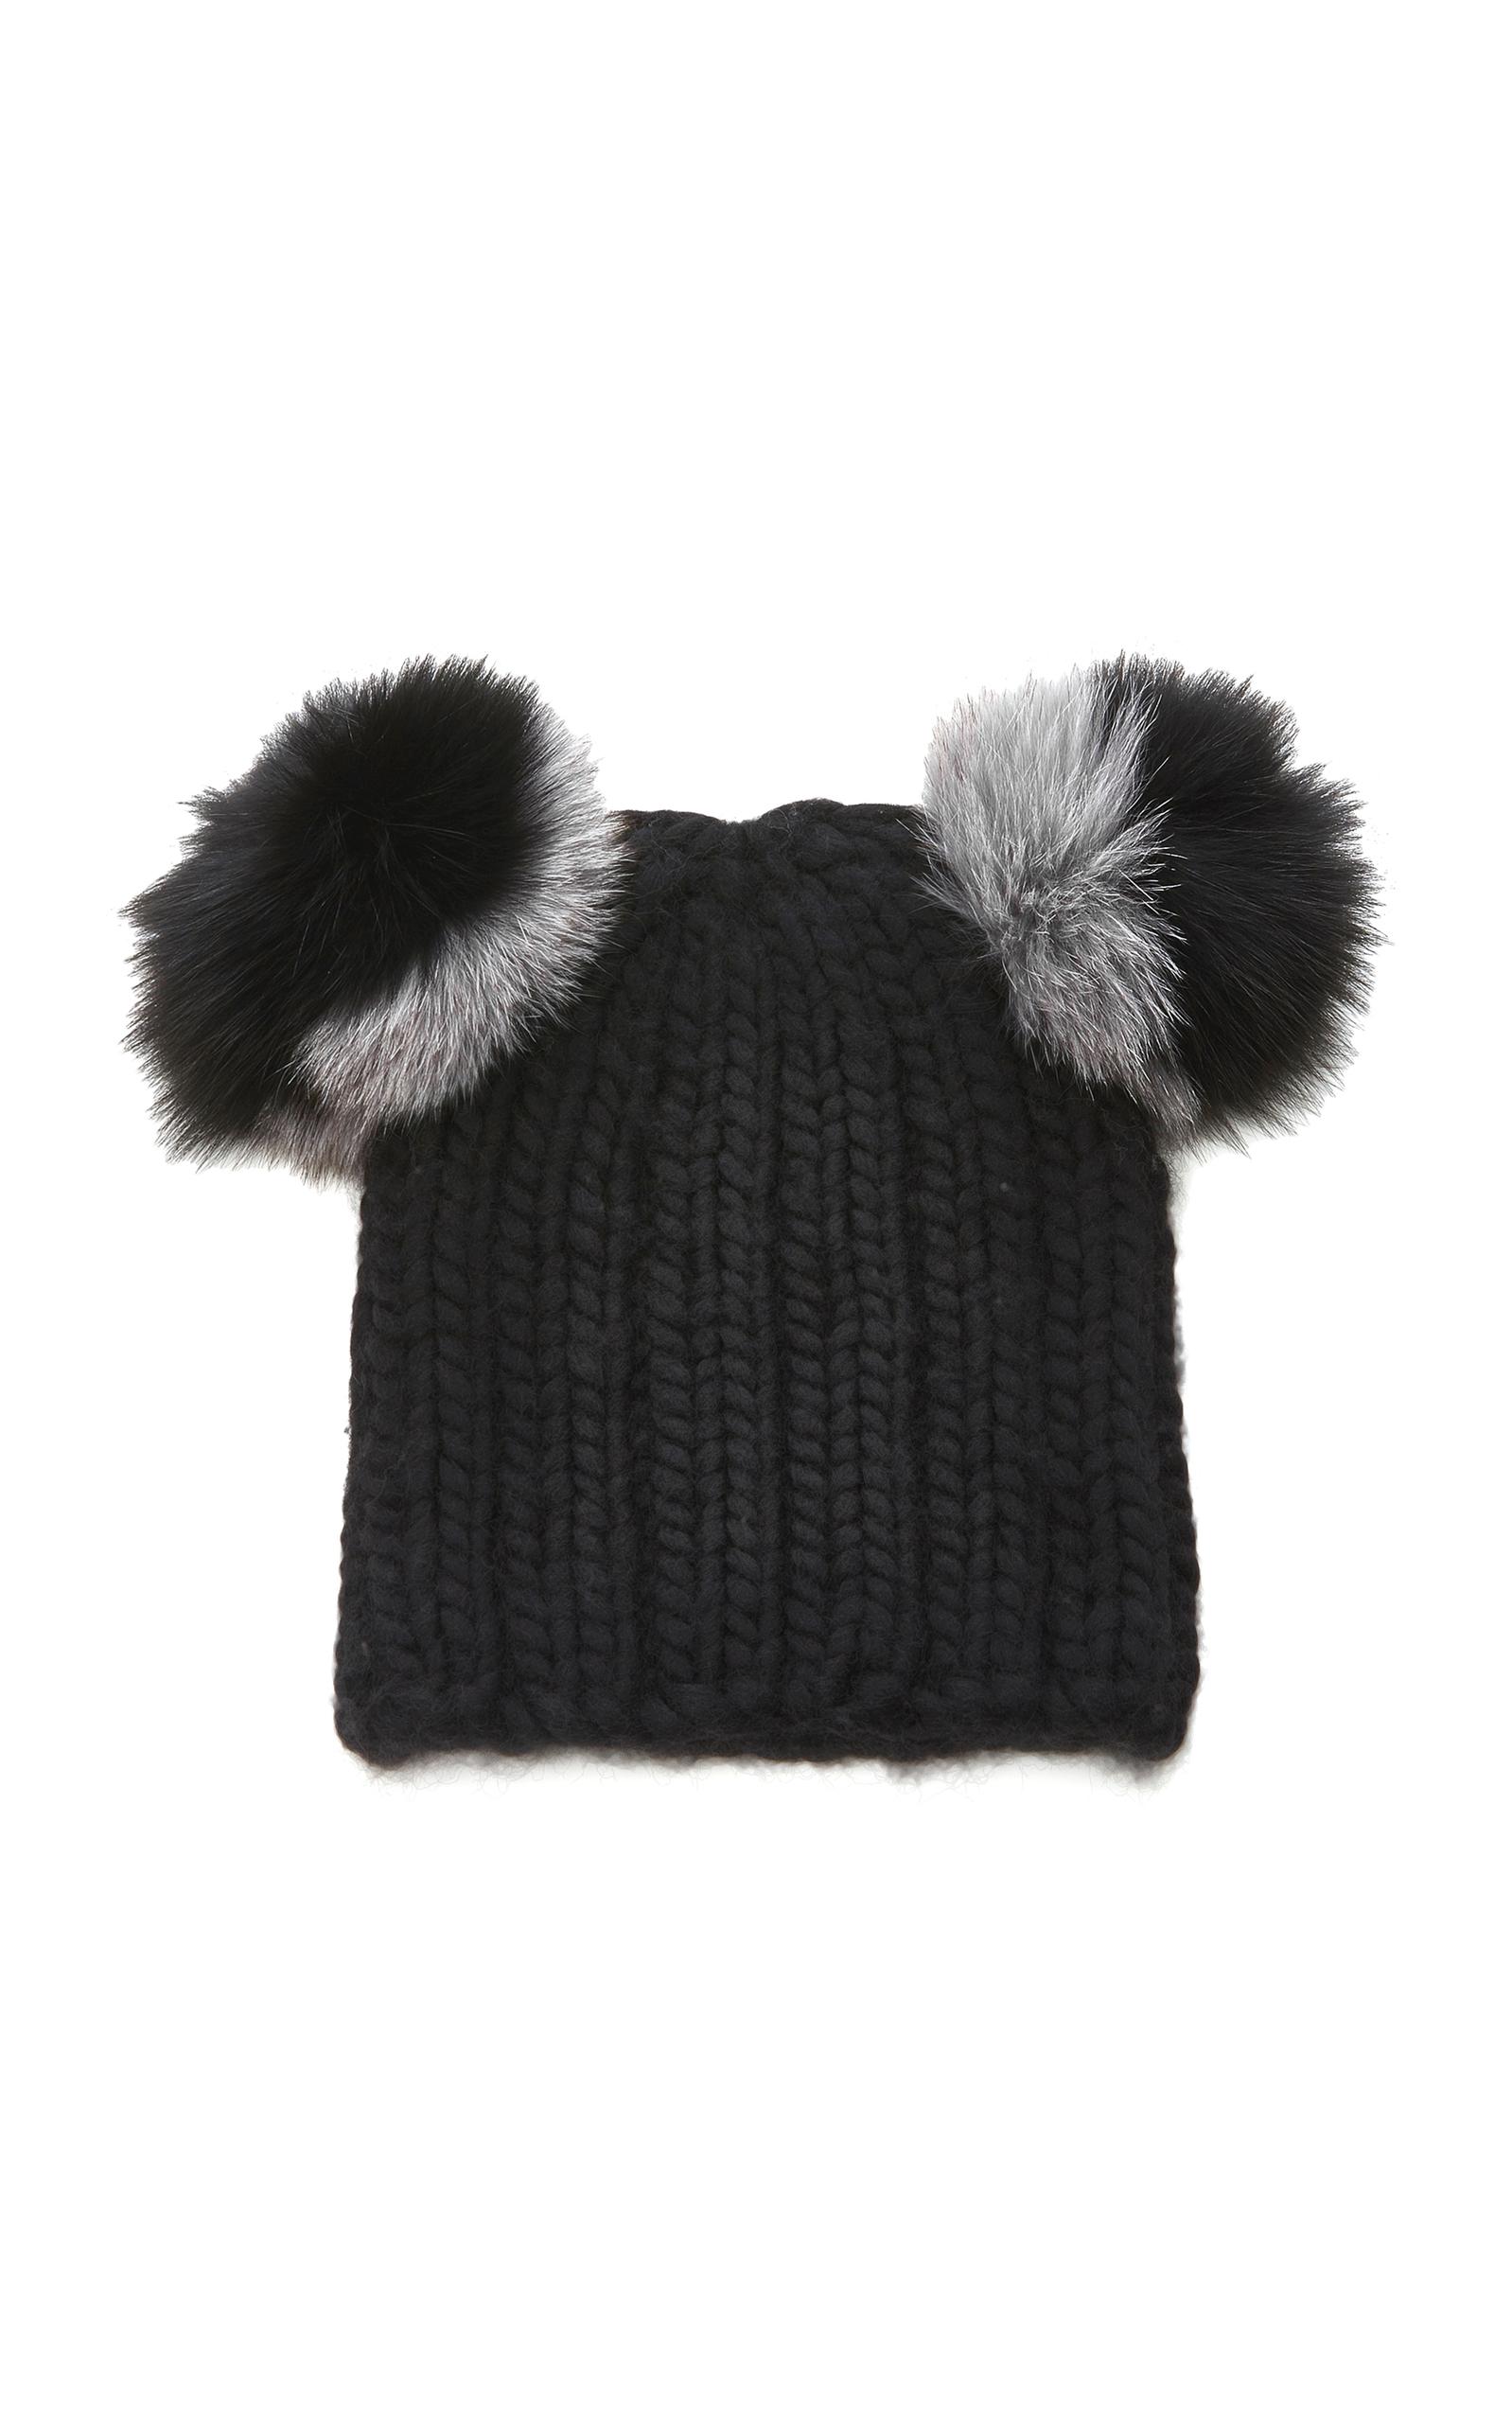 Eugenia Kim Mimi Beanie With Genuine Fox Fur Pompoms - Black